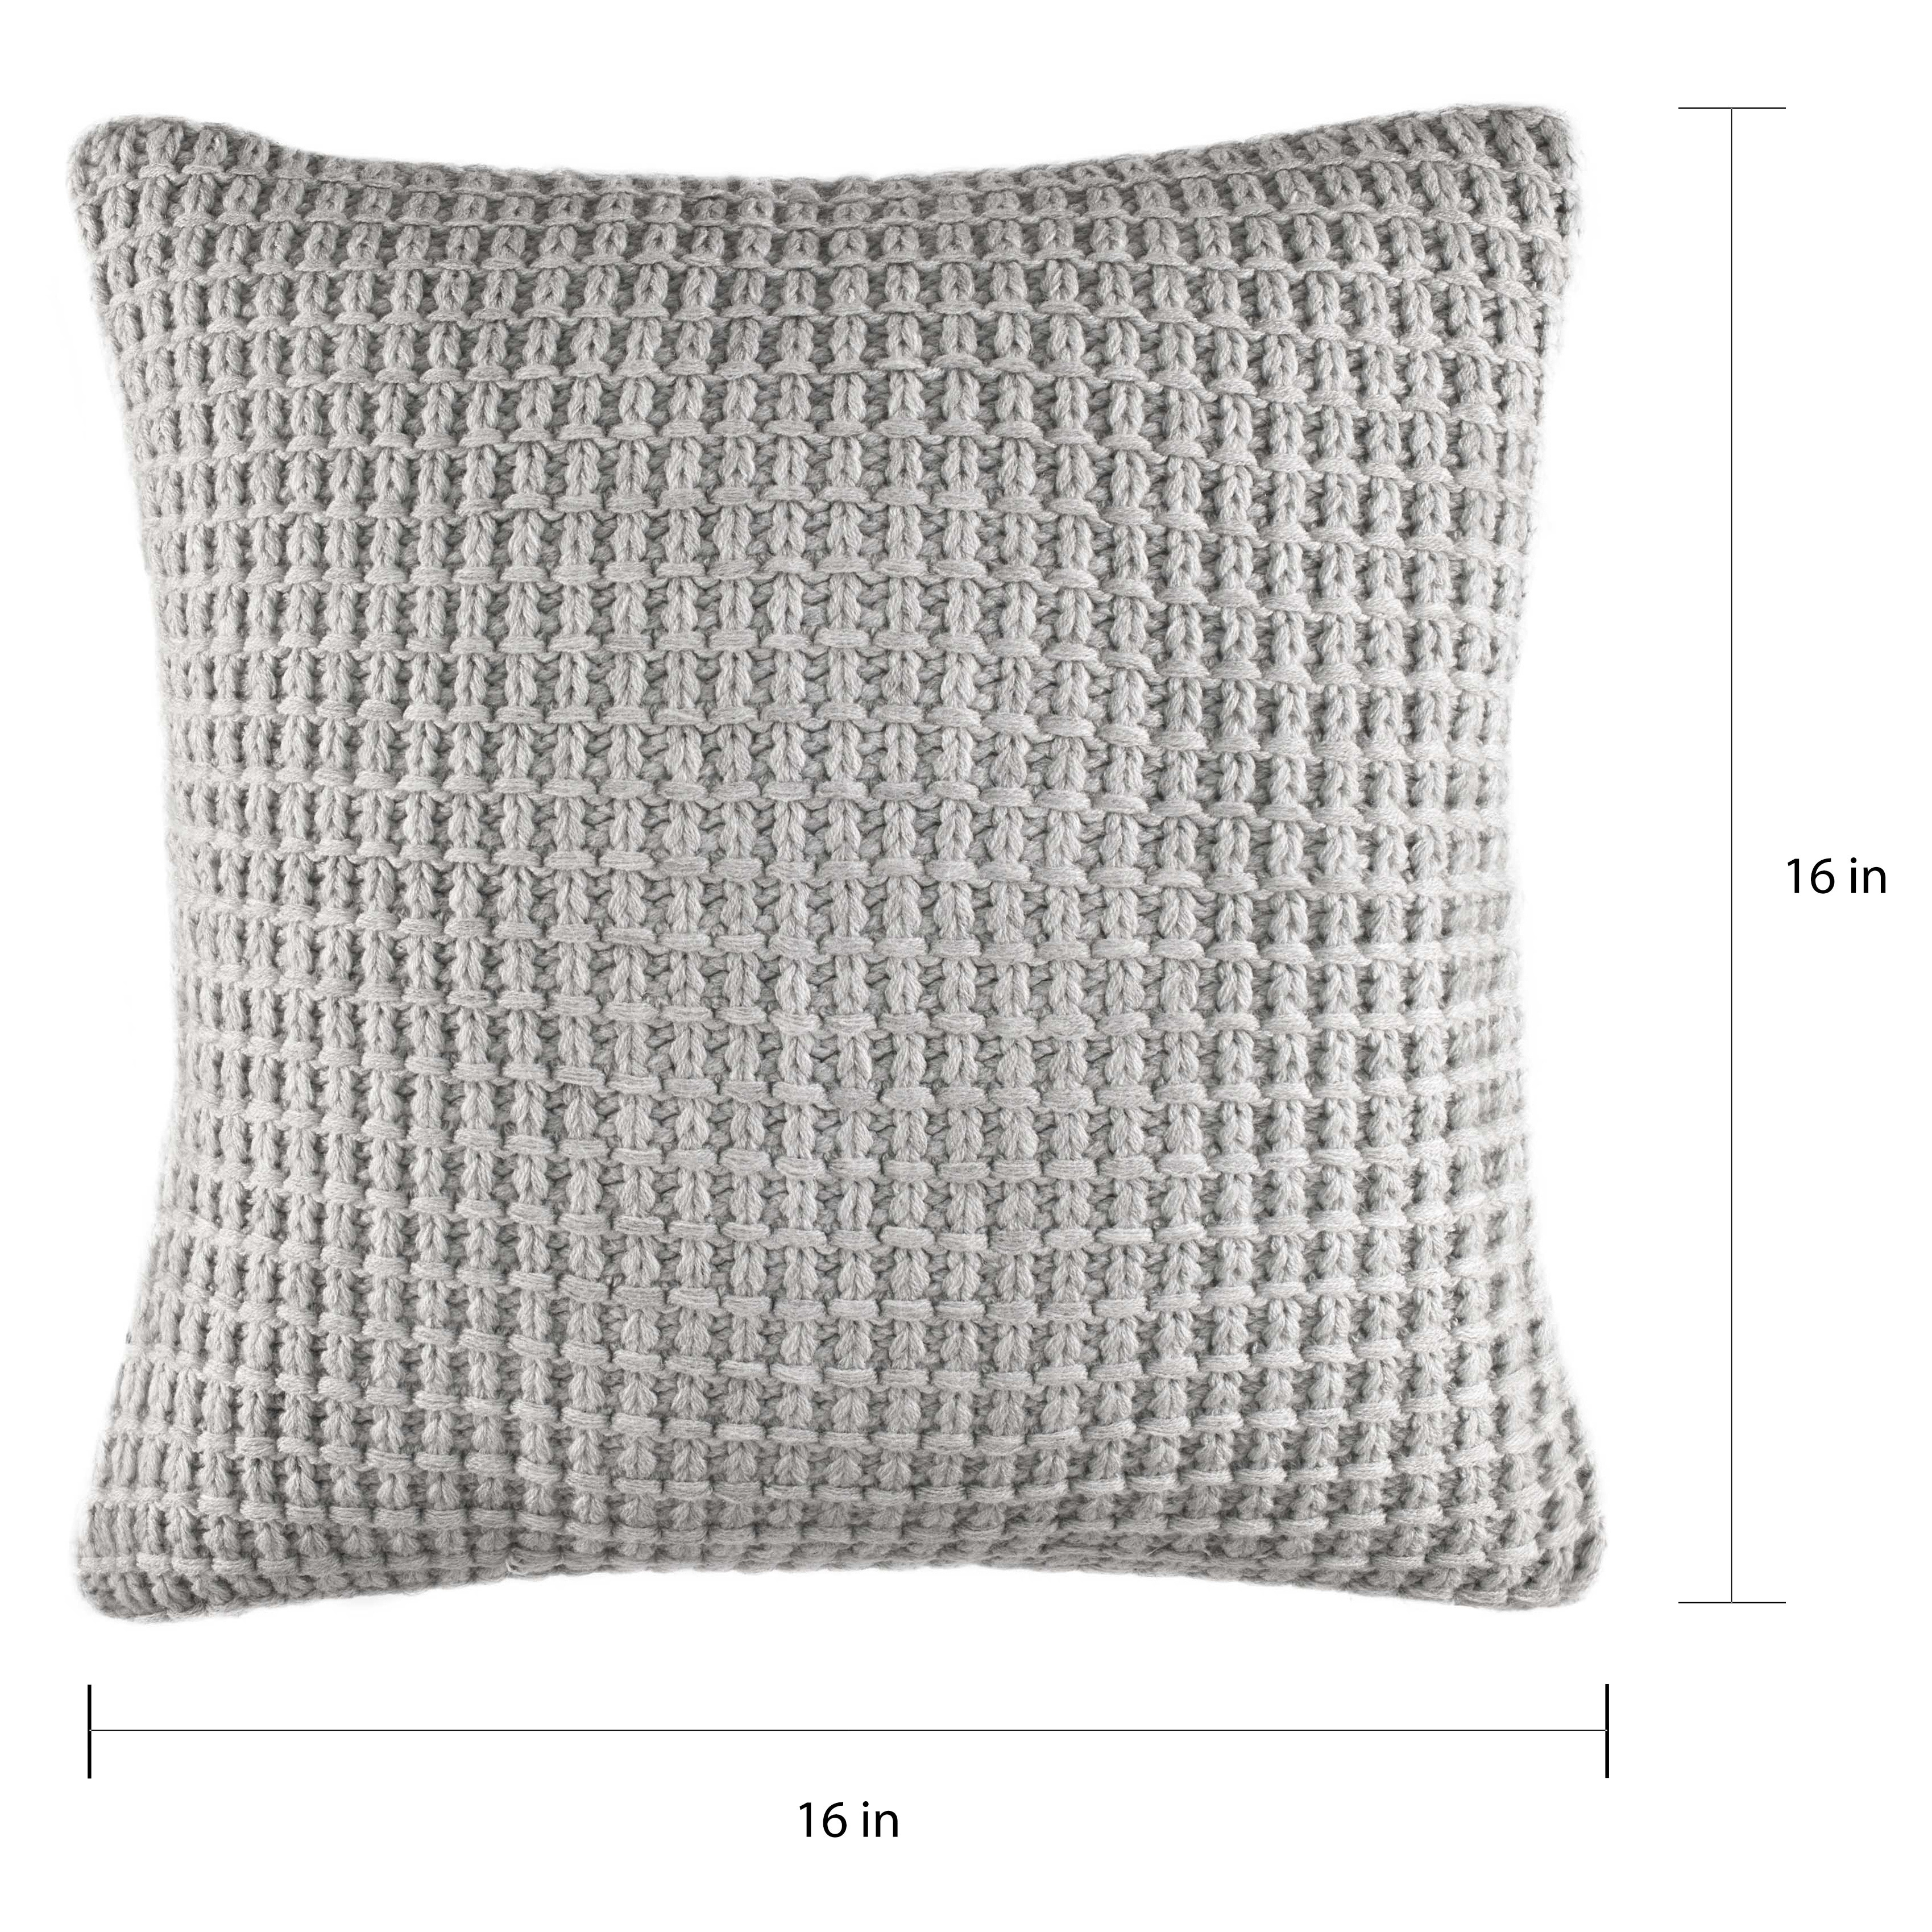 Nautica Fairwater Knit Throw Pillow On Sale Overstock 14986859